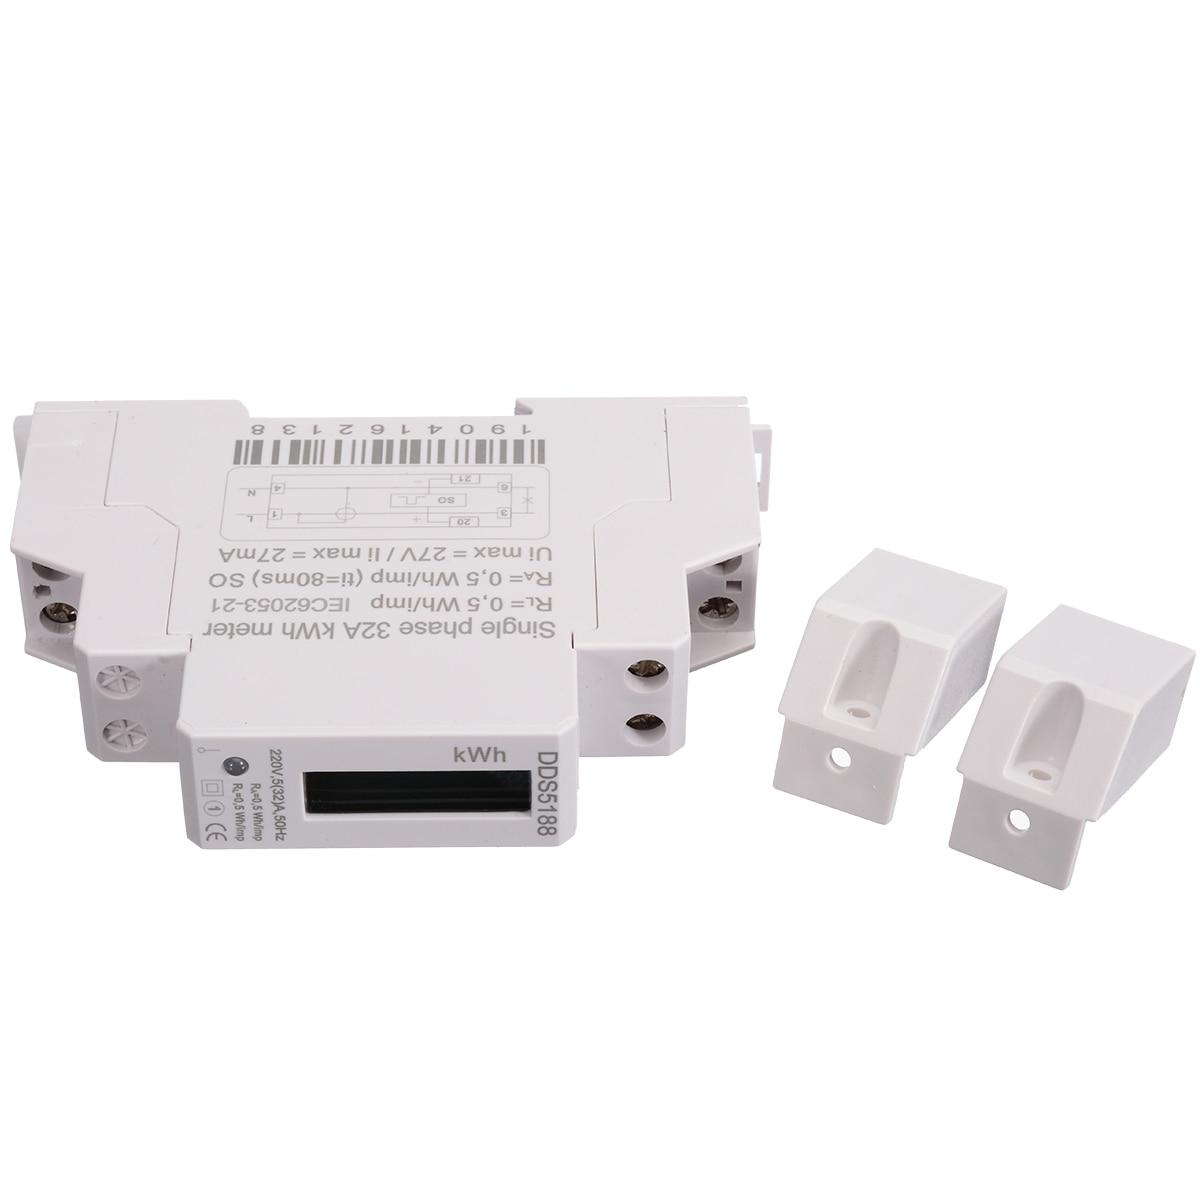 DDS5188 LCD 5 32 A 230V AC Single Phase Pole DIN Rail Kilowatt Hour kwh Meter Energy Power Meter Digital LED Display in Energy Meters from Tools